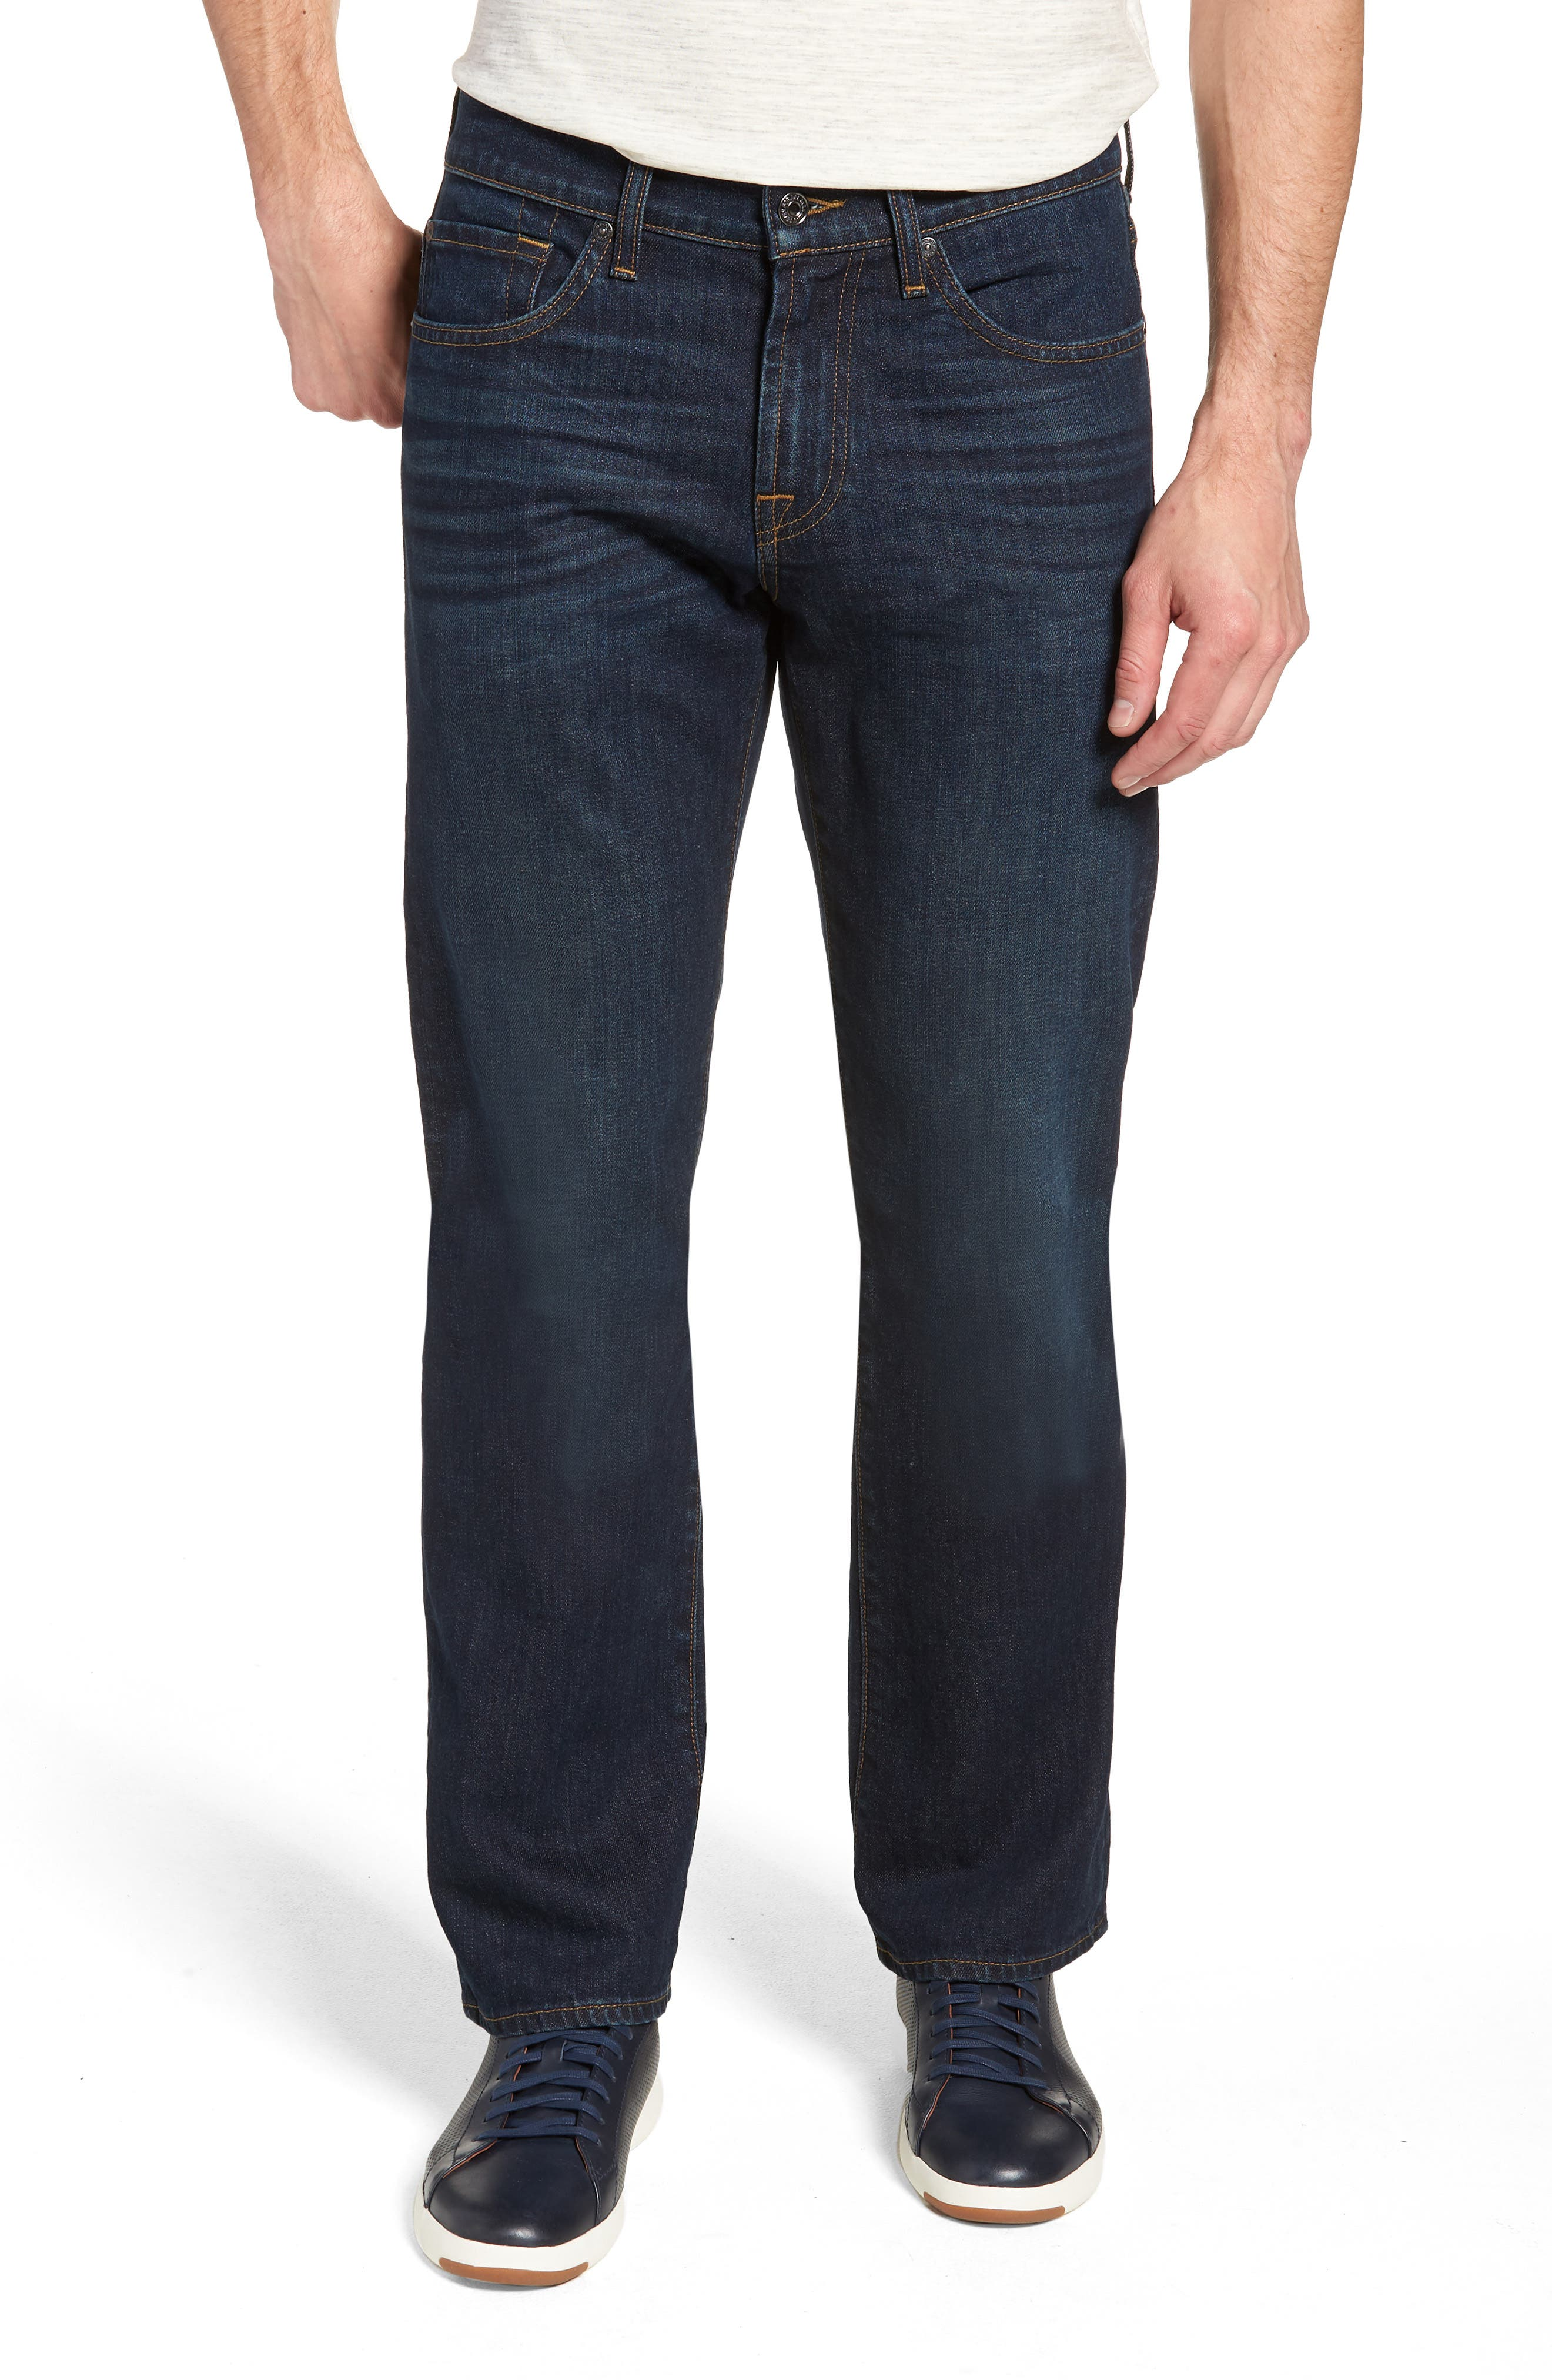 Austyn Relaxed Straight Leg Jeans, Main, color, ABERDEEN